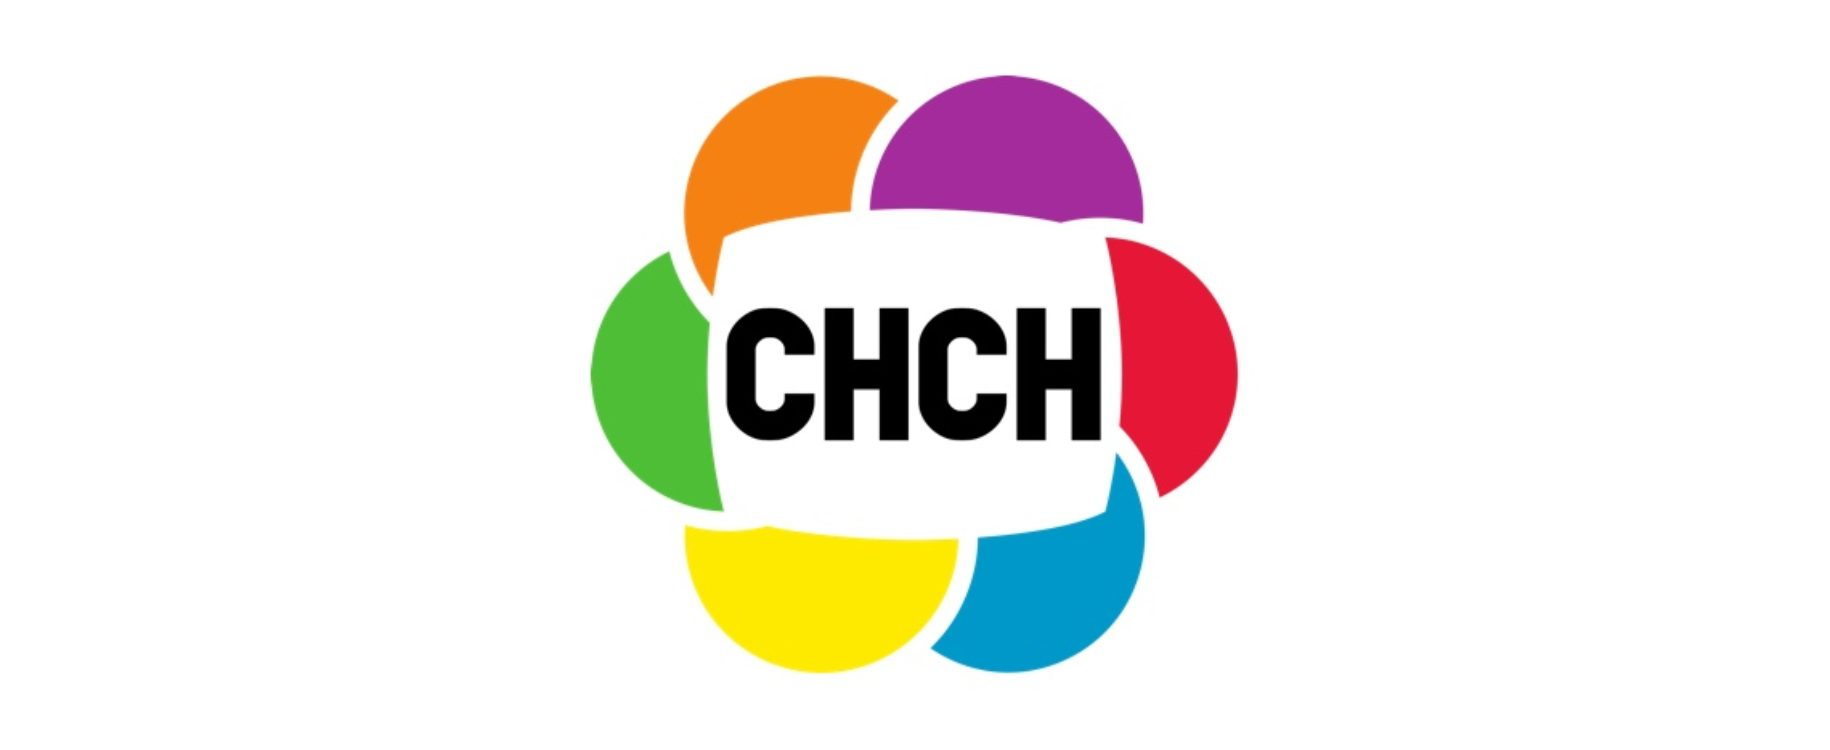 CHCH Morning Live: CEO Dr. Brett Belchetz demonstrates Maple in action